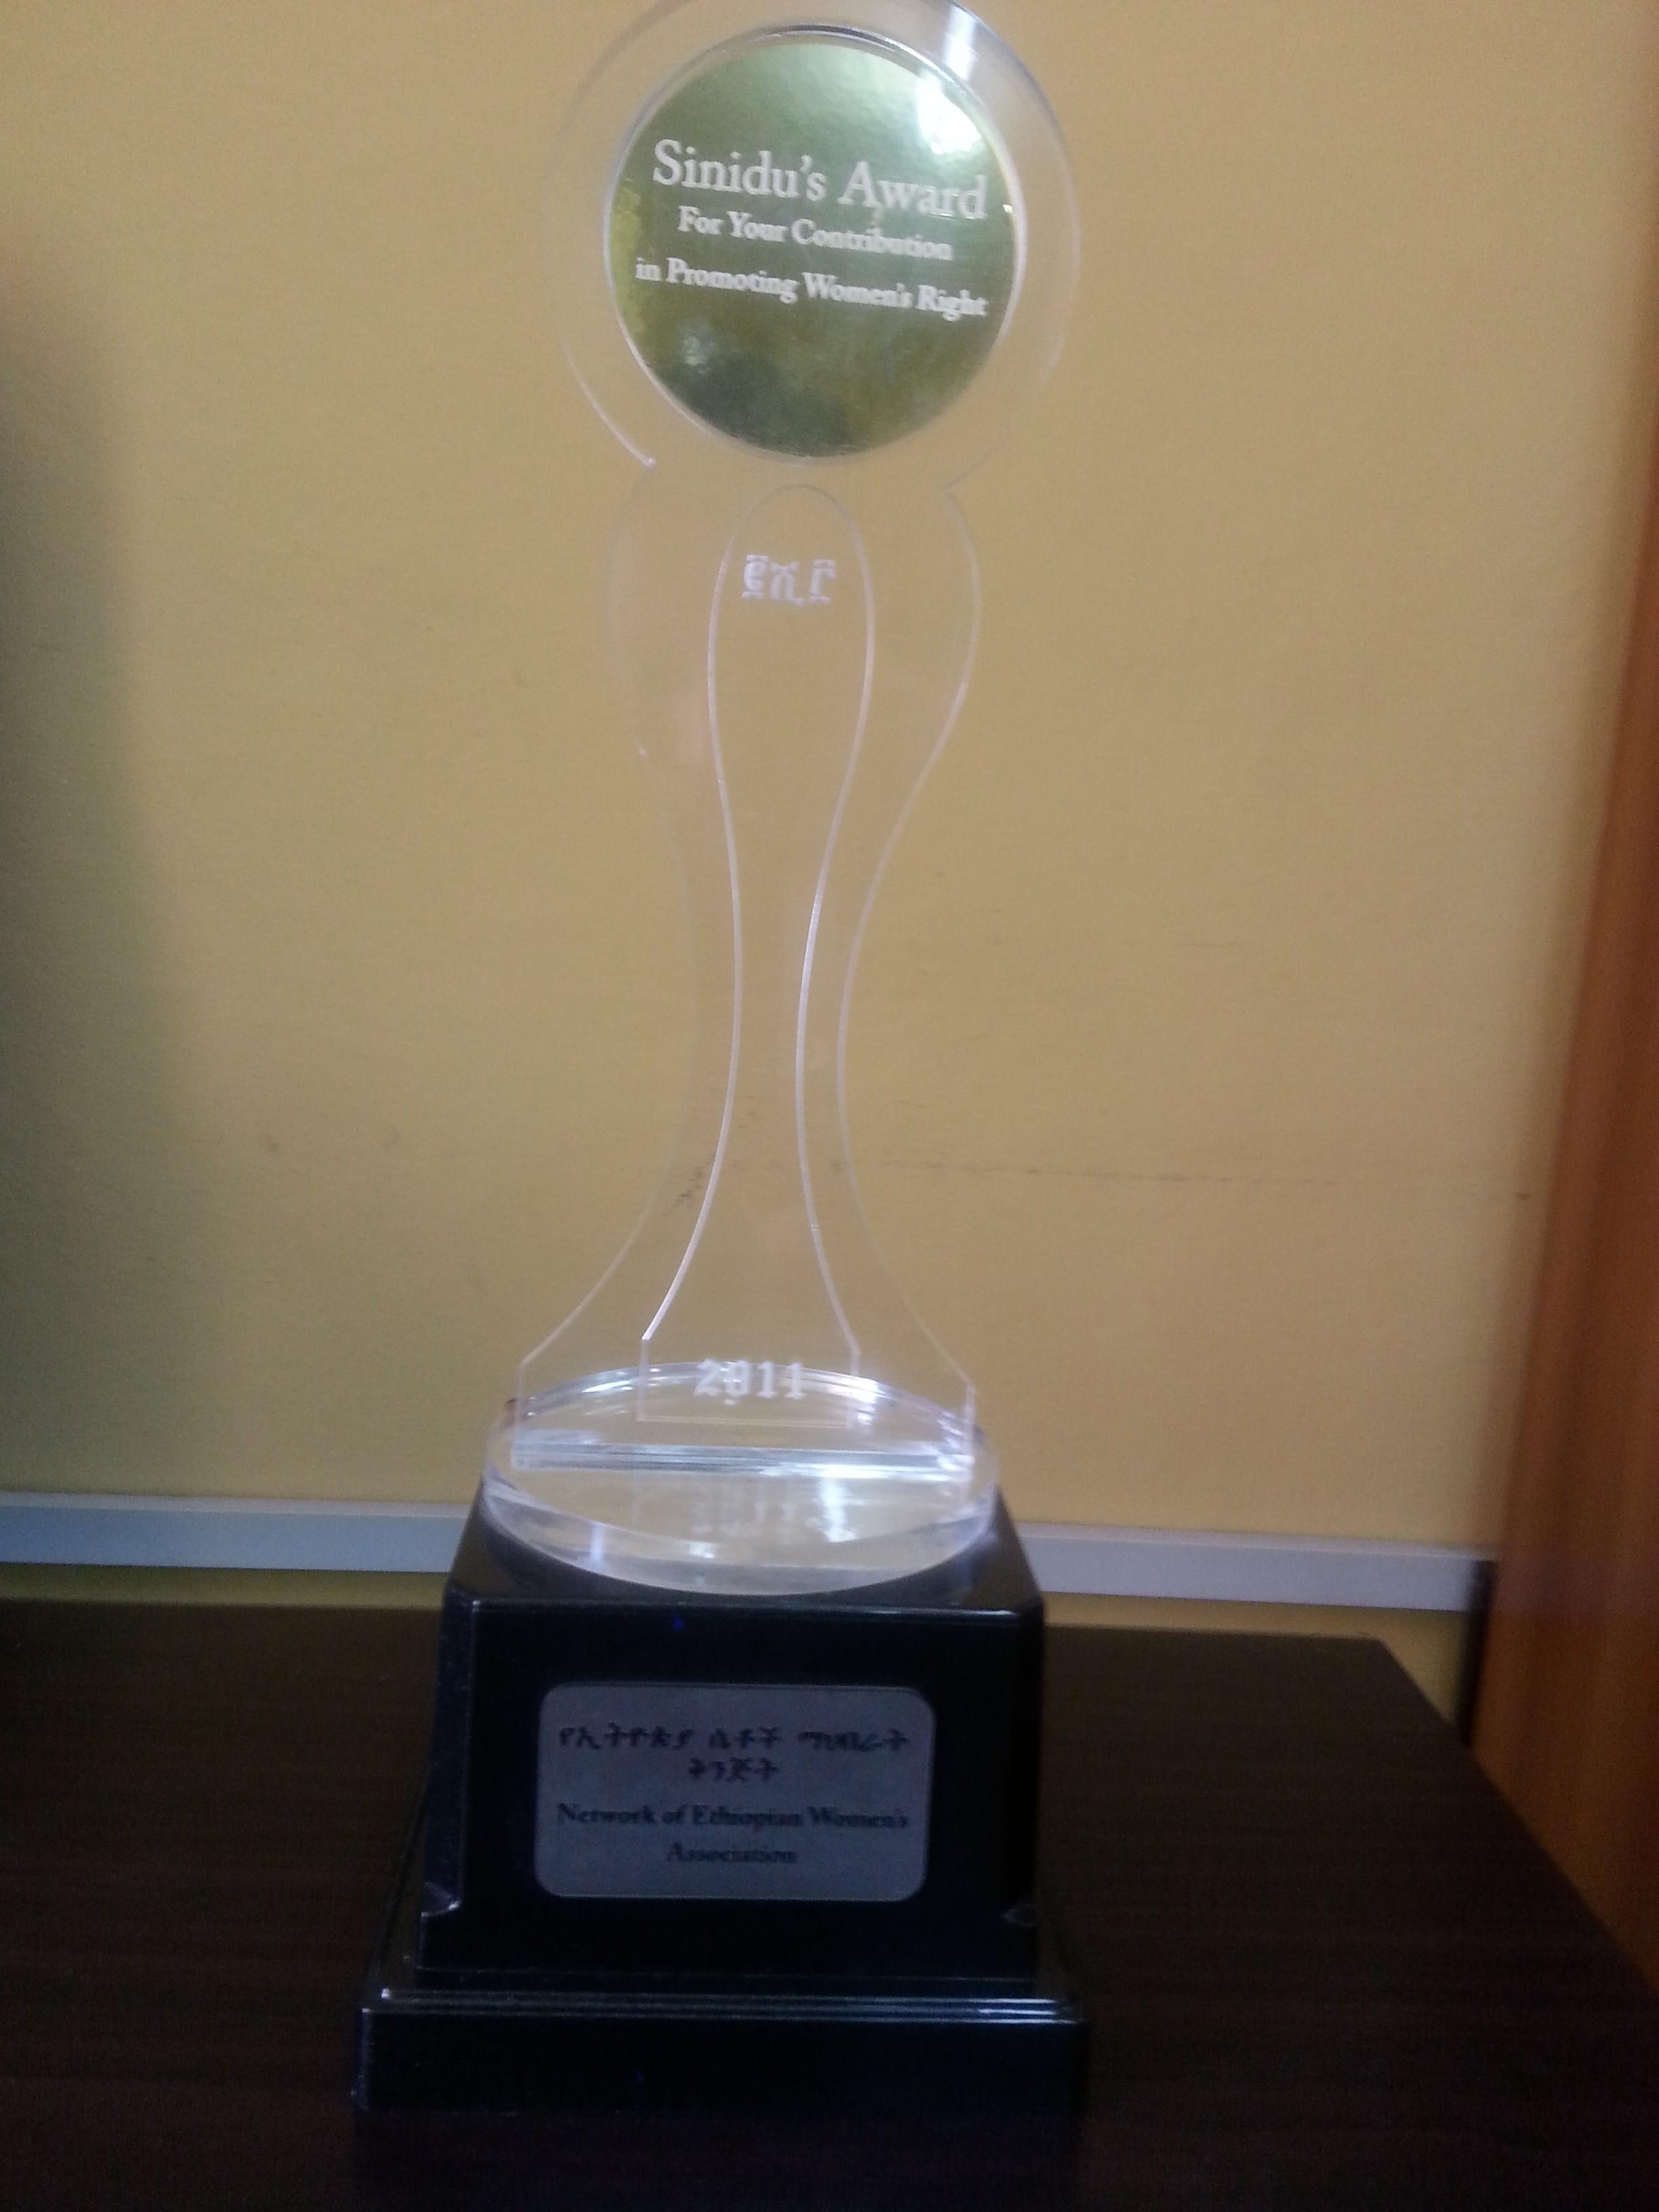 Sinidu's Award 2014